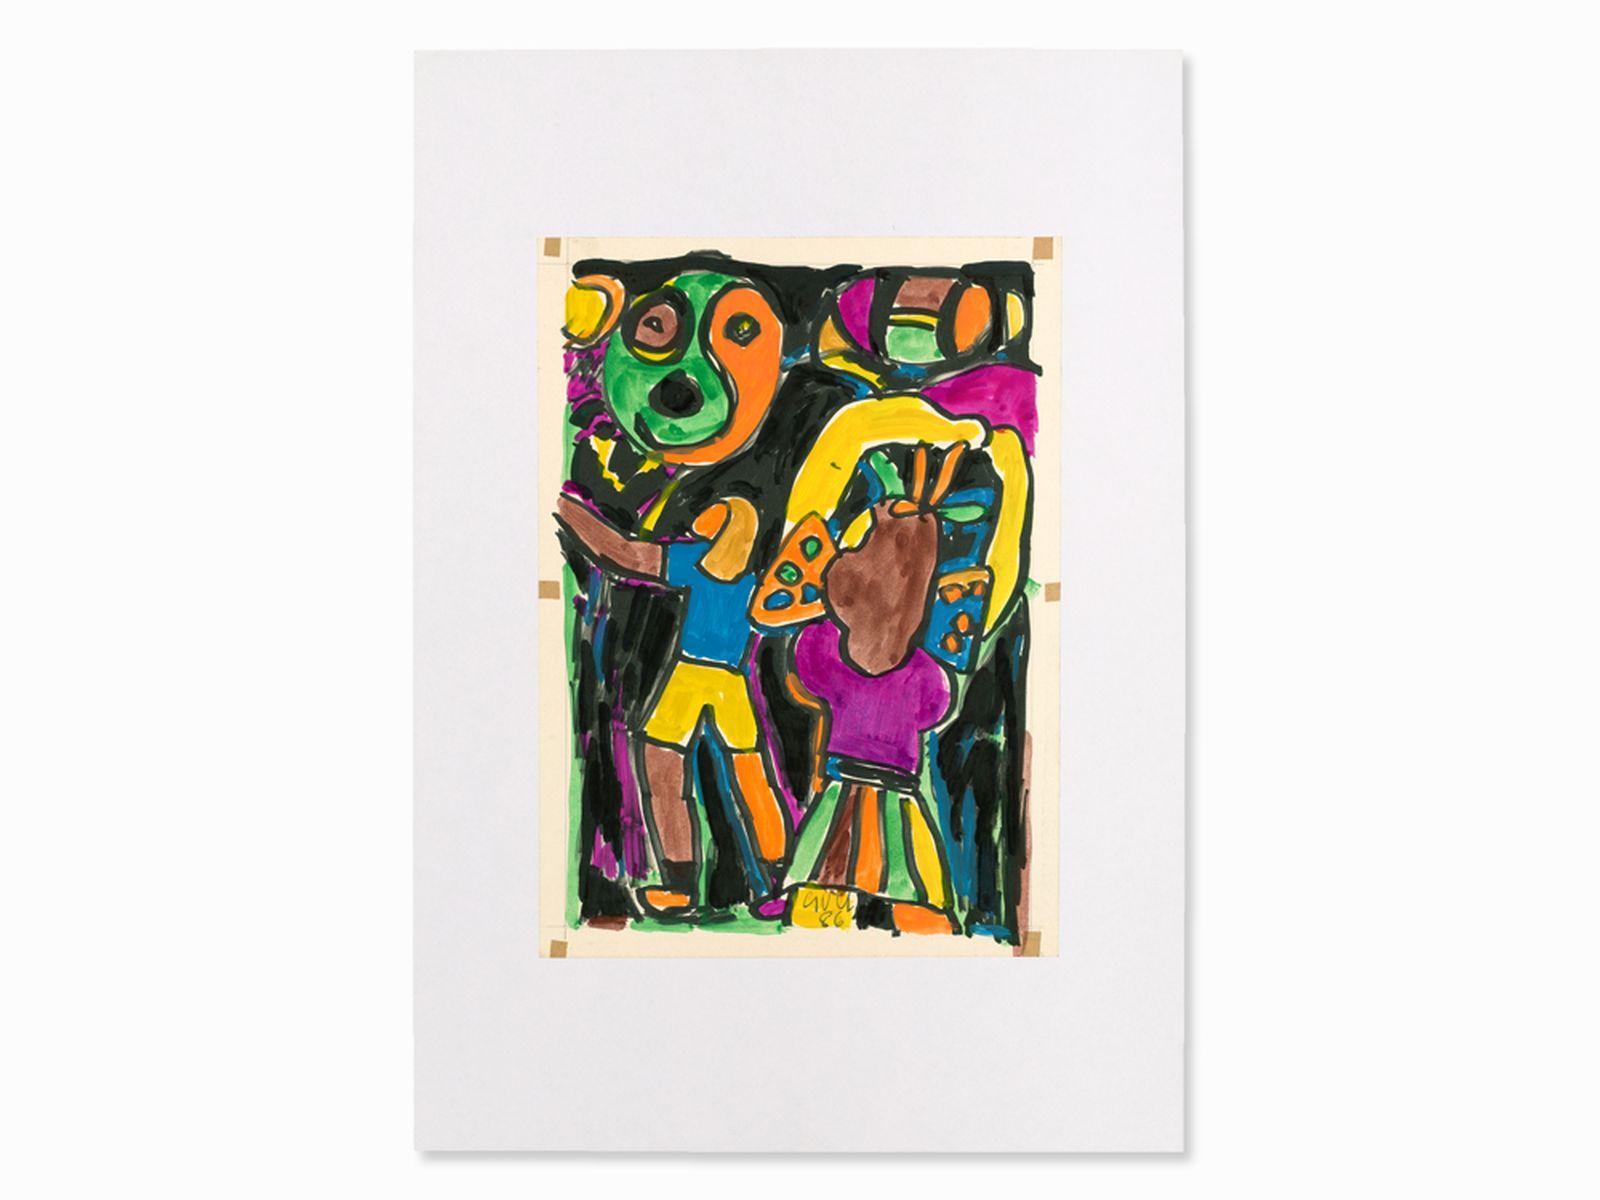 #23 Miklos Németh, Mixed Media, Colorful Composition, Hungary, ´86   Miklos Németh, Mischtechnik, Lebhafte Komposition, Ungarn,´86 Image